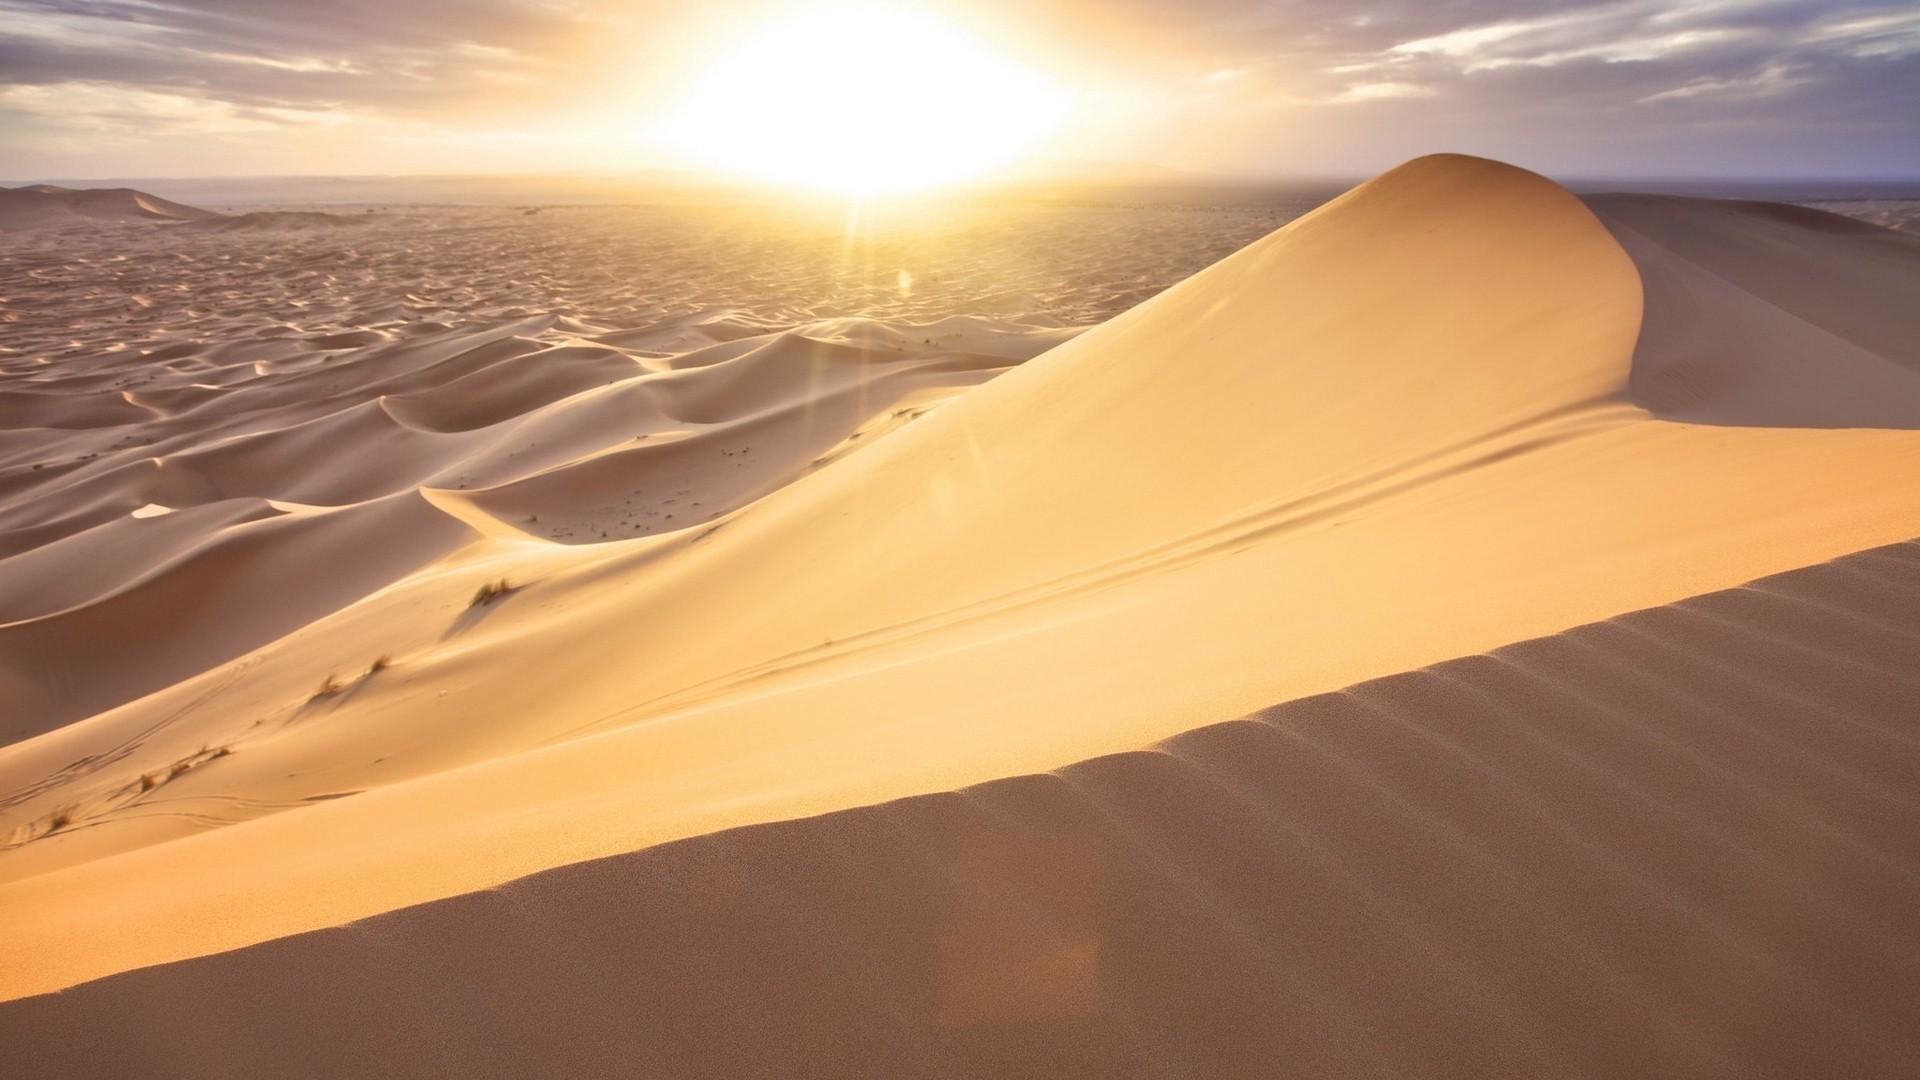 Sahara desktop wallpaper hd